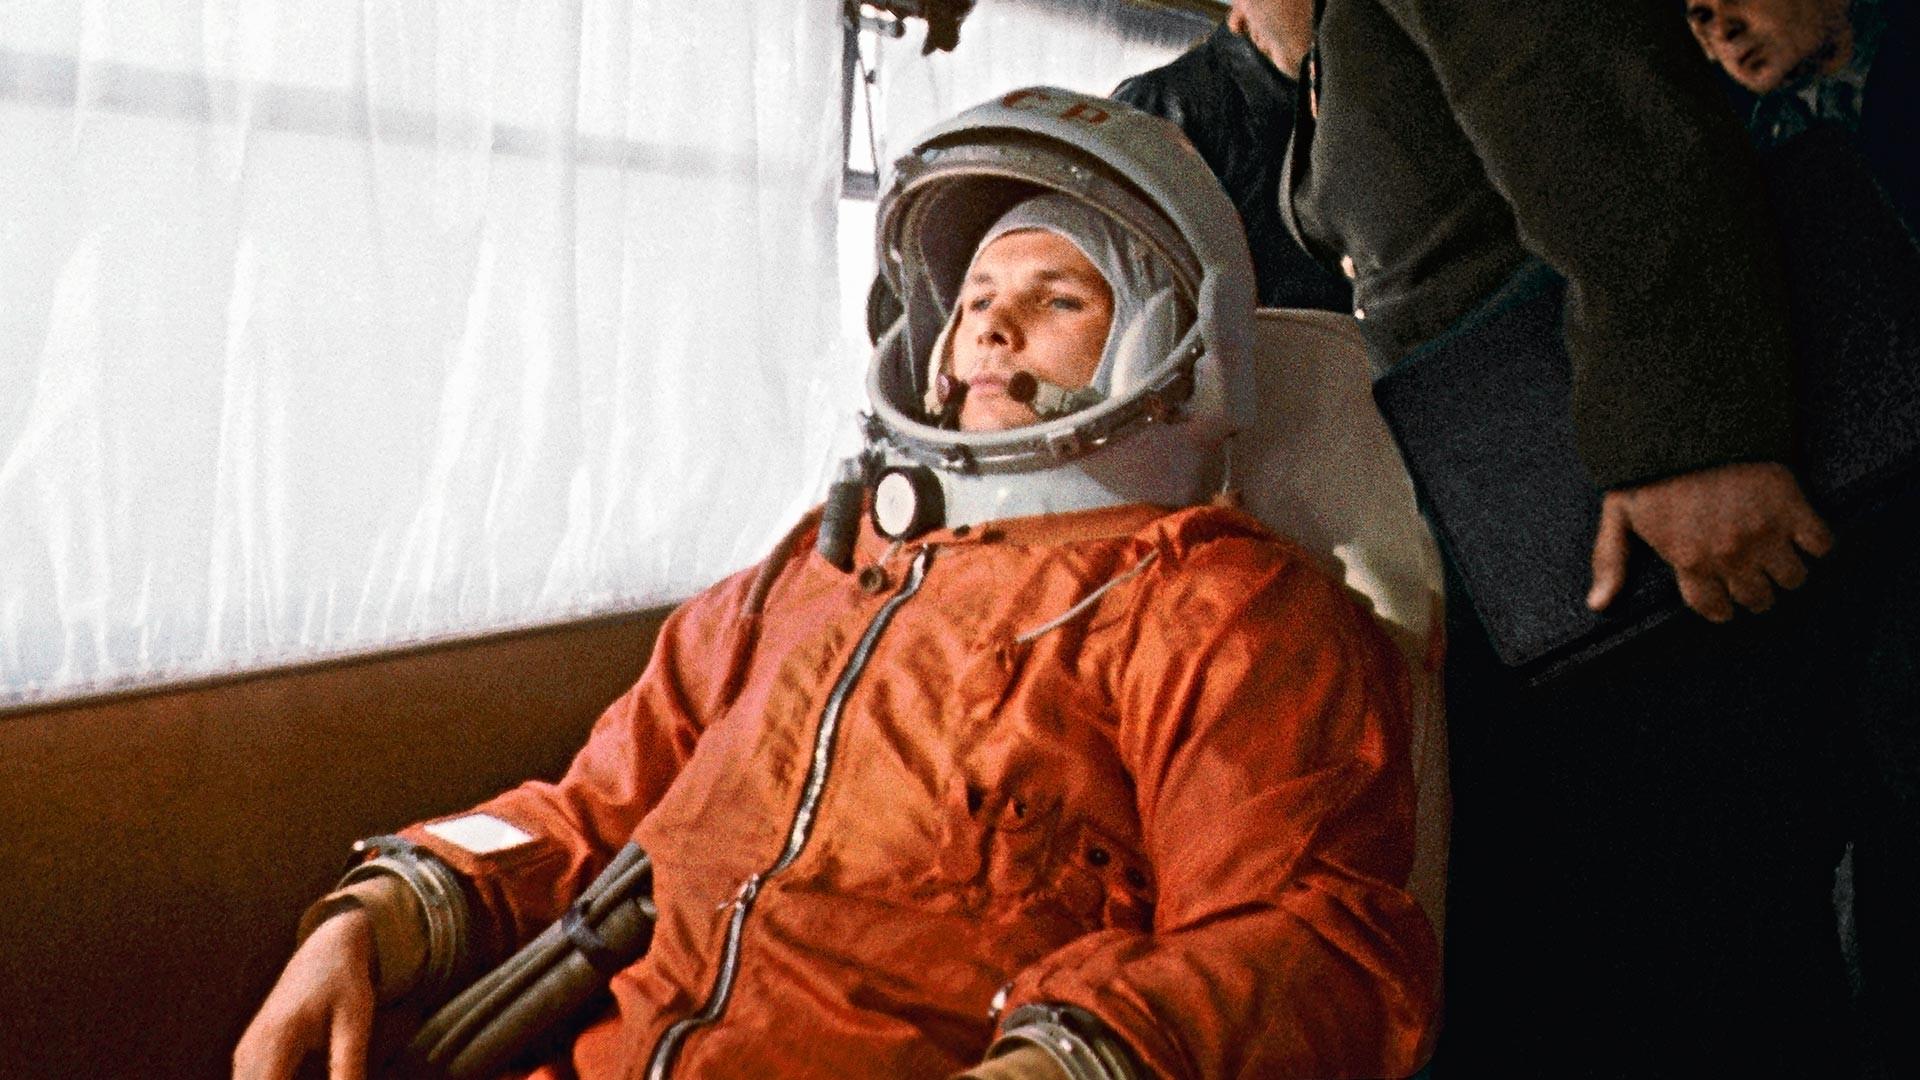 Iouri Gagarine sur le chemin du cosmodrome de Baïkonour, le 12 avril 1961.